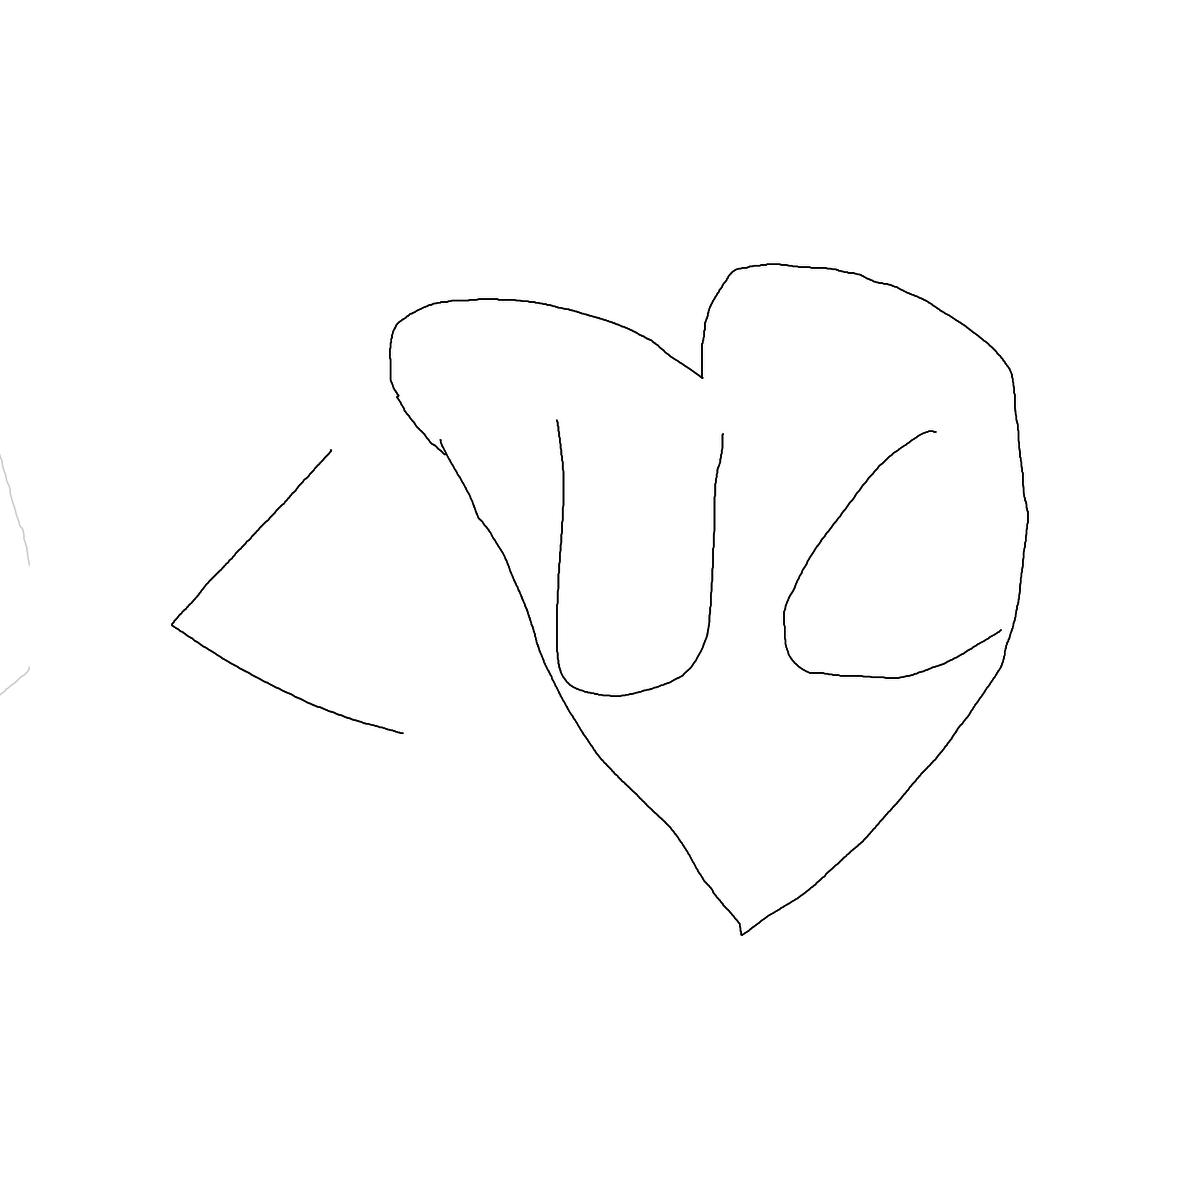 BAAAM drawing#16138 lat:38.2183914184570300lng: -85.7576751708984400